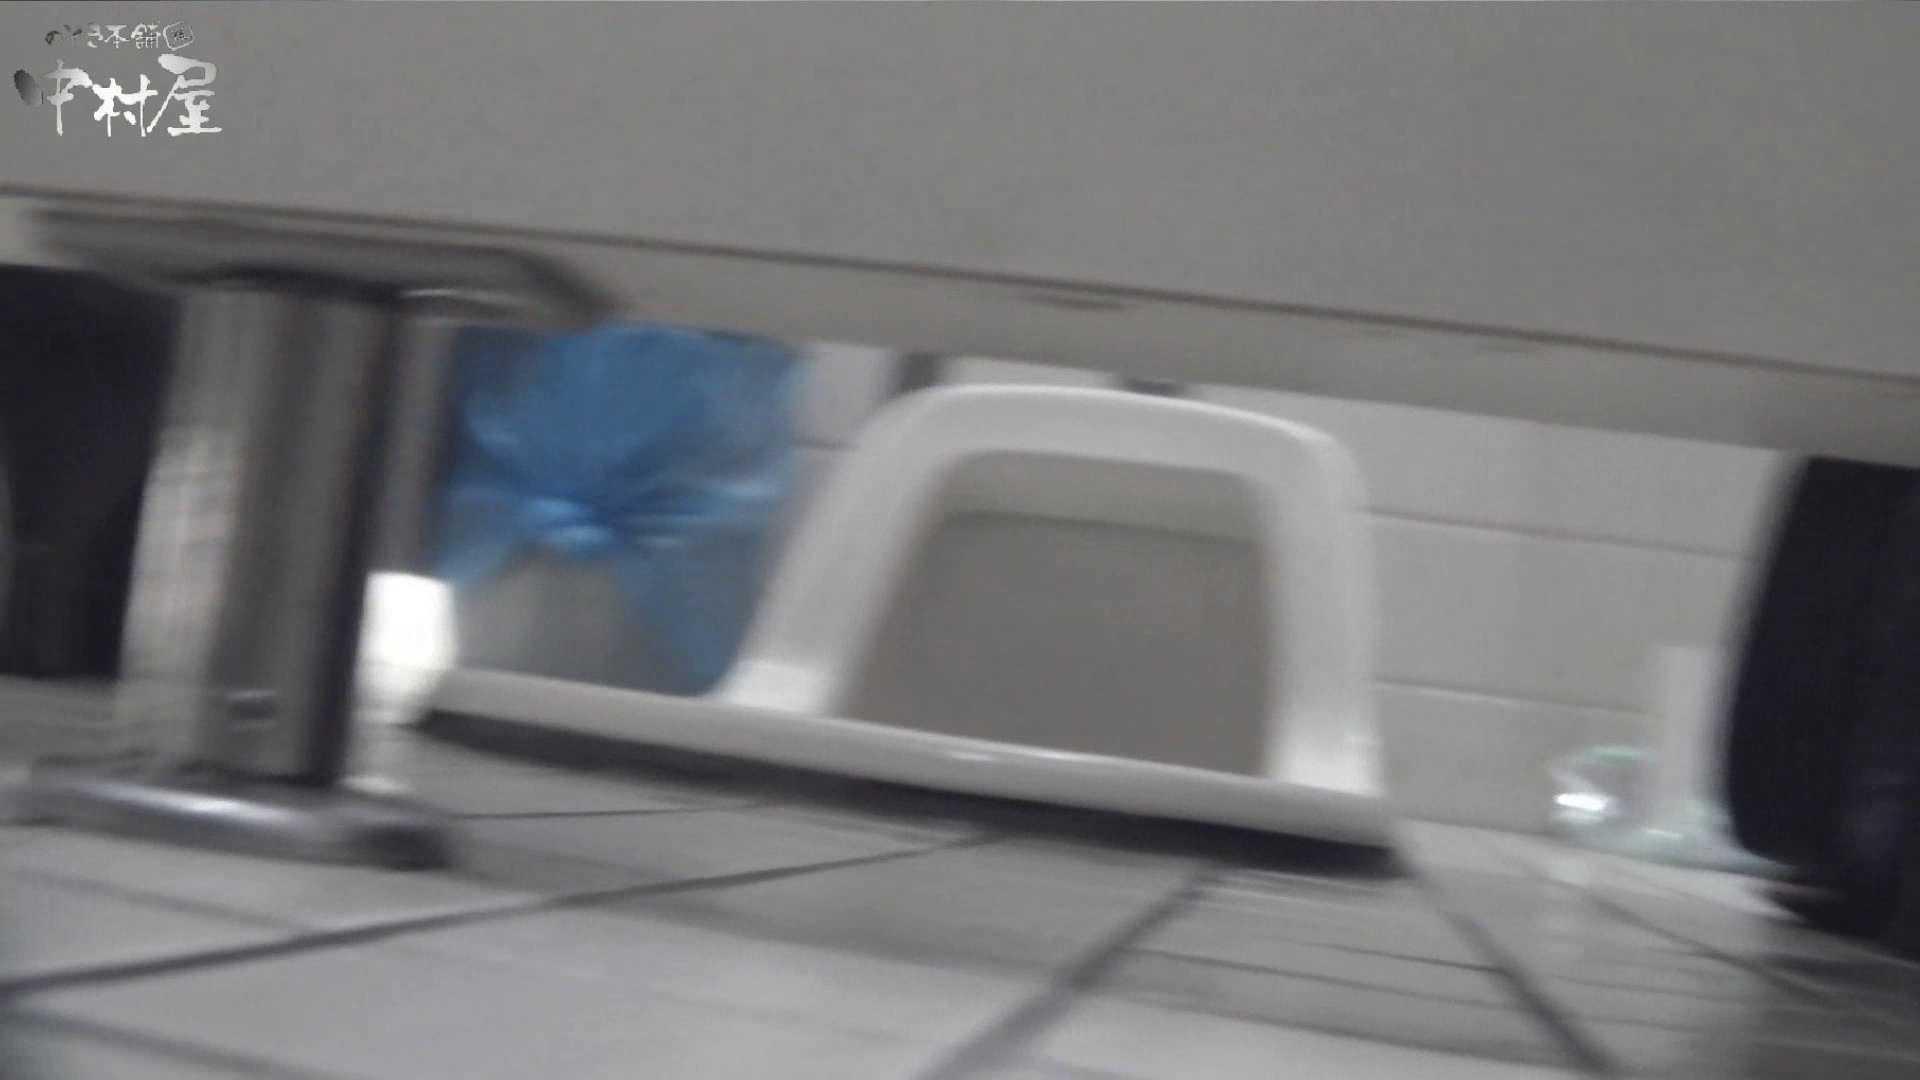 vol.54 命がけ潜伏洗面所! ヲリモノとろりん OL女体 ぱこり動画紹介 76連発 26